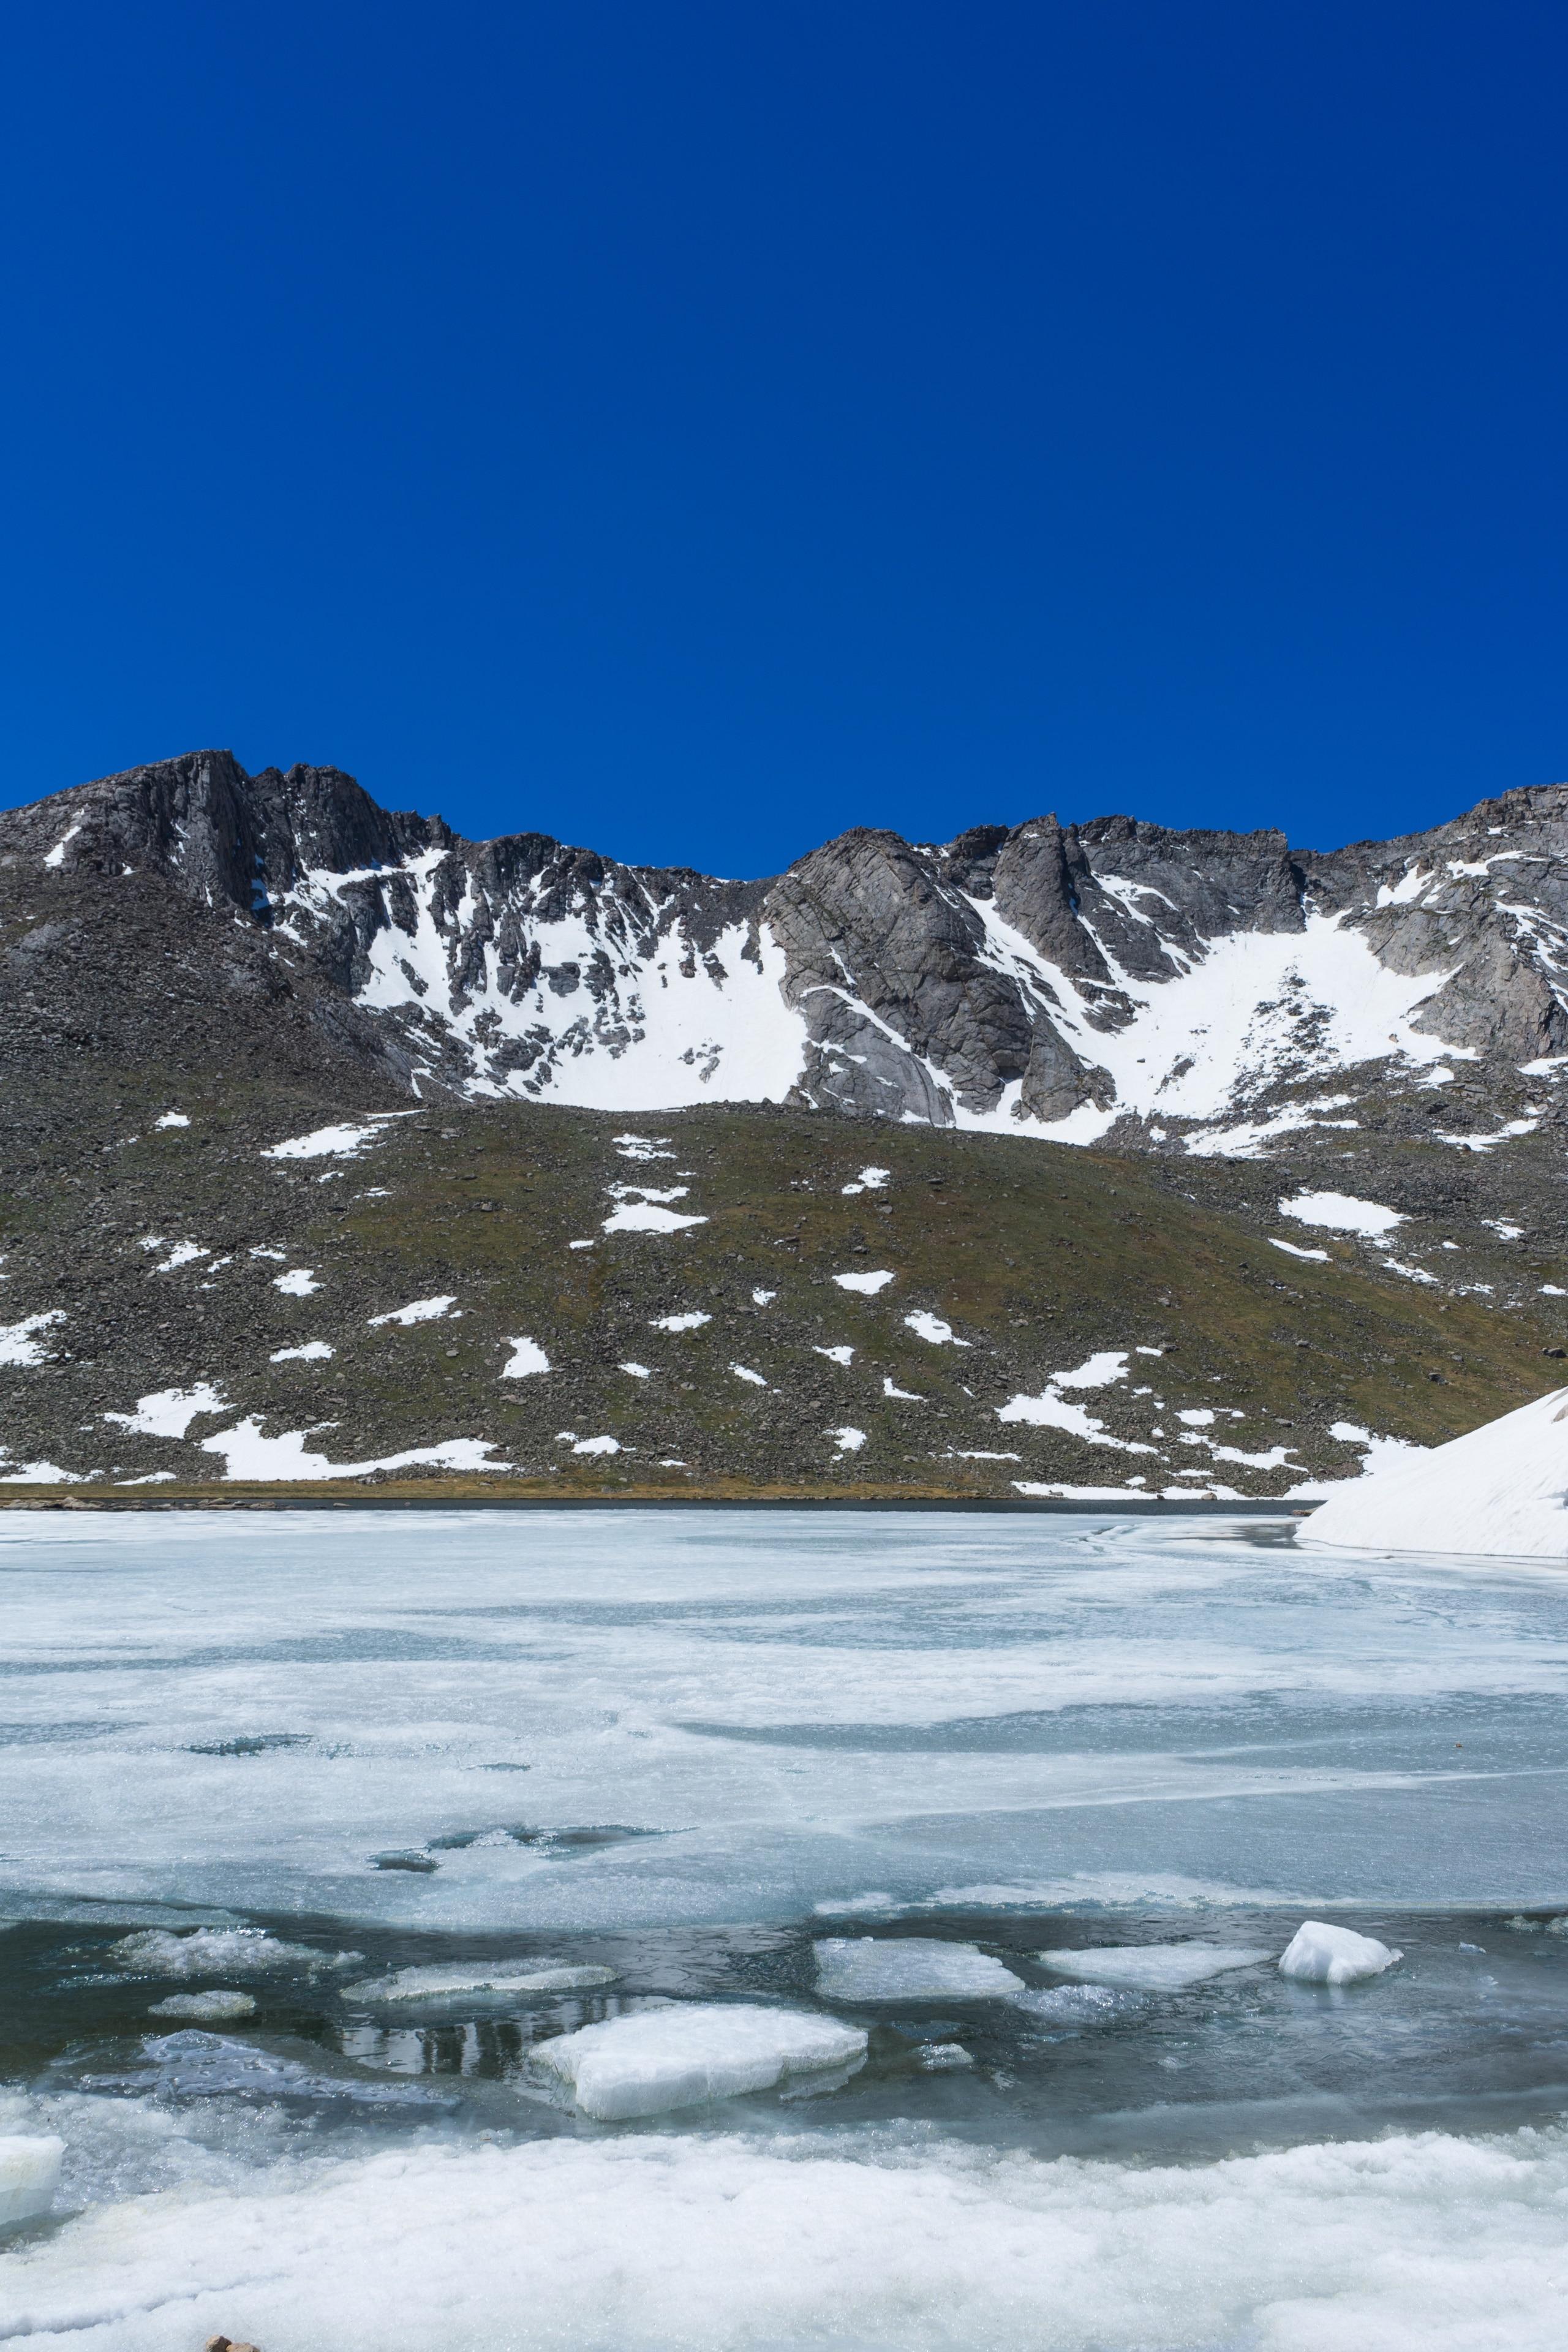 Summit Lake Park, Idaho Springs, Colorado, United States of America